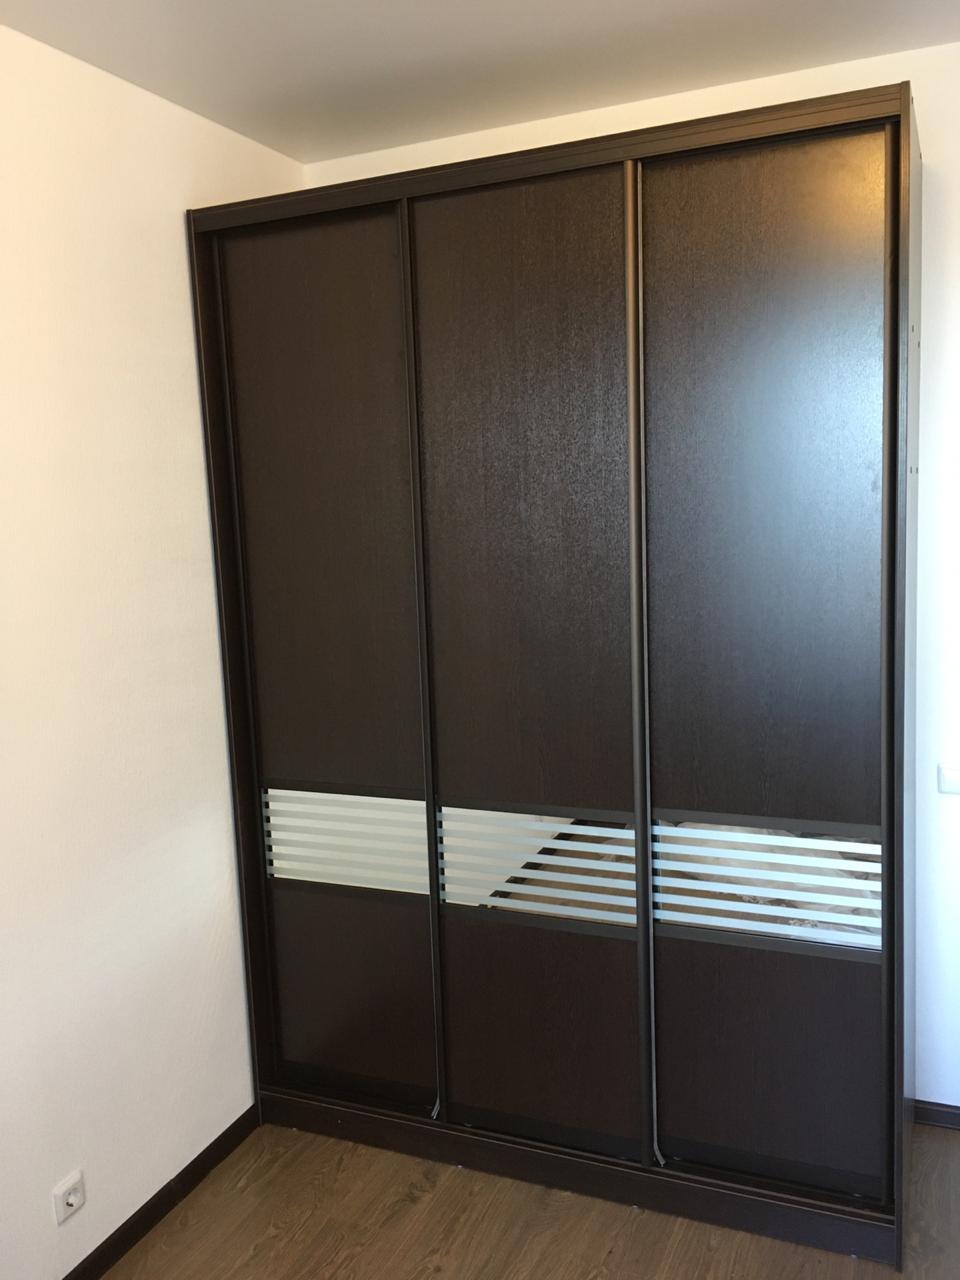 Шкаф-купе 3-х створчатый ЛДСП Венге Цаво со вставками